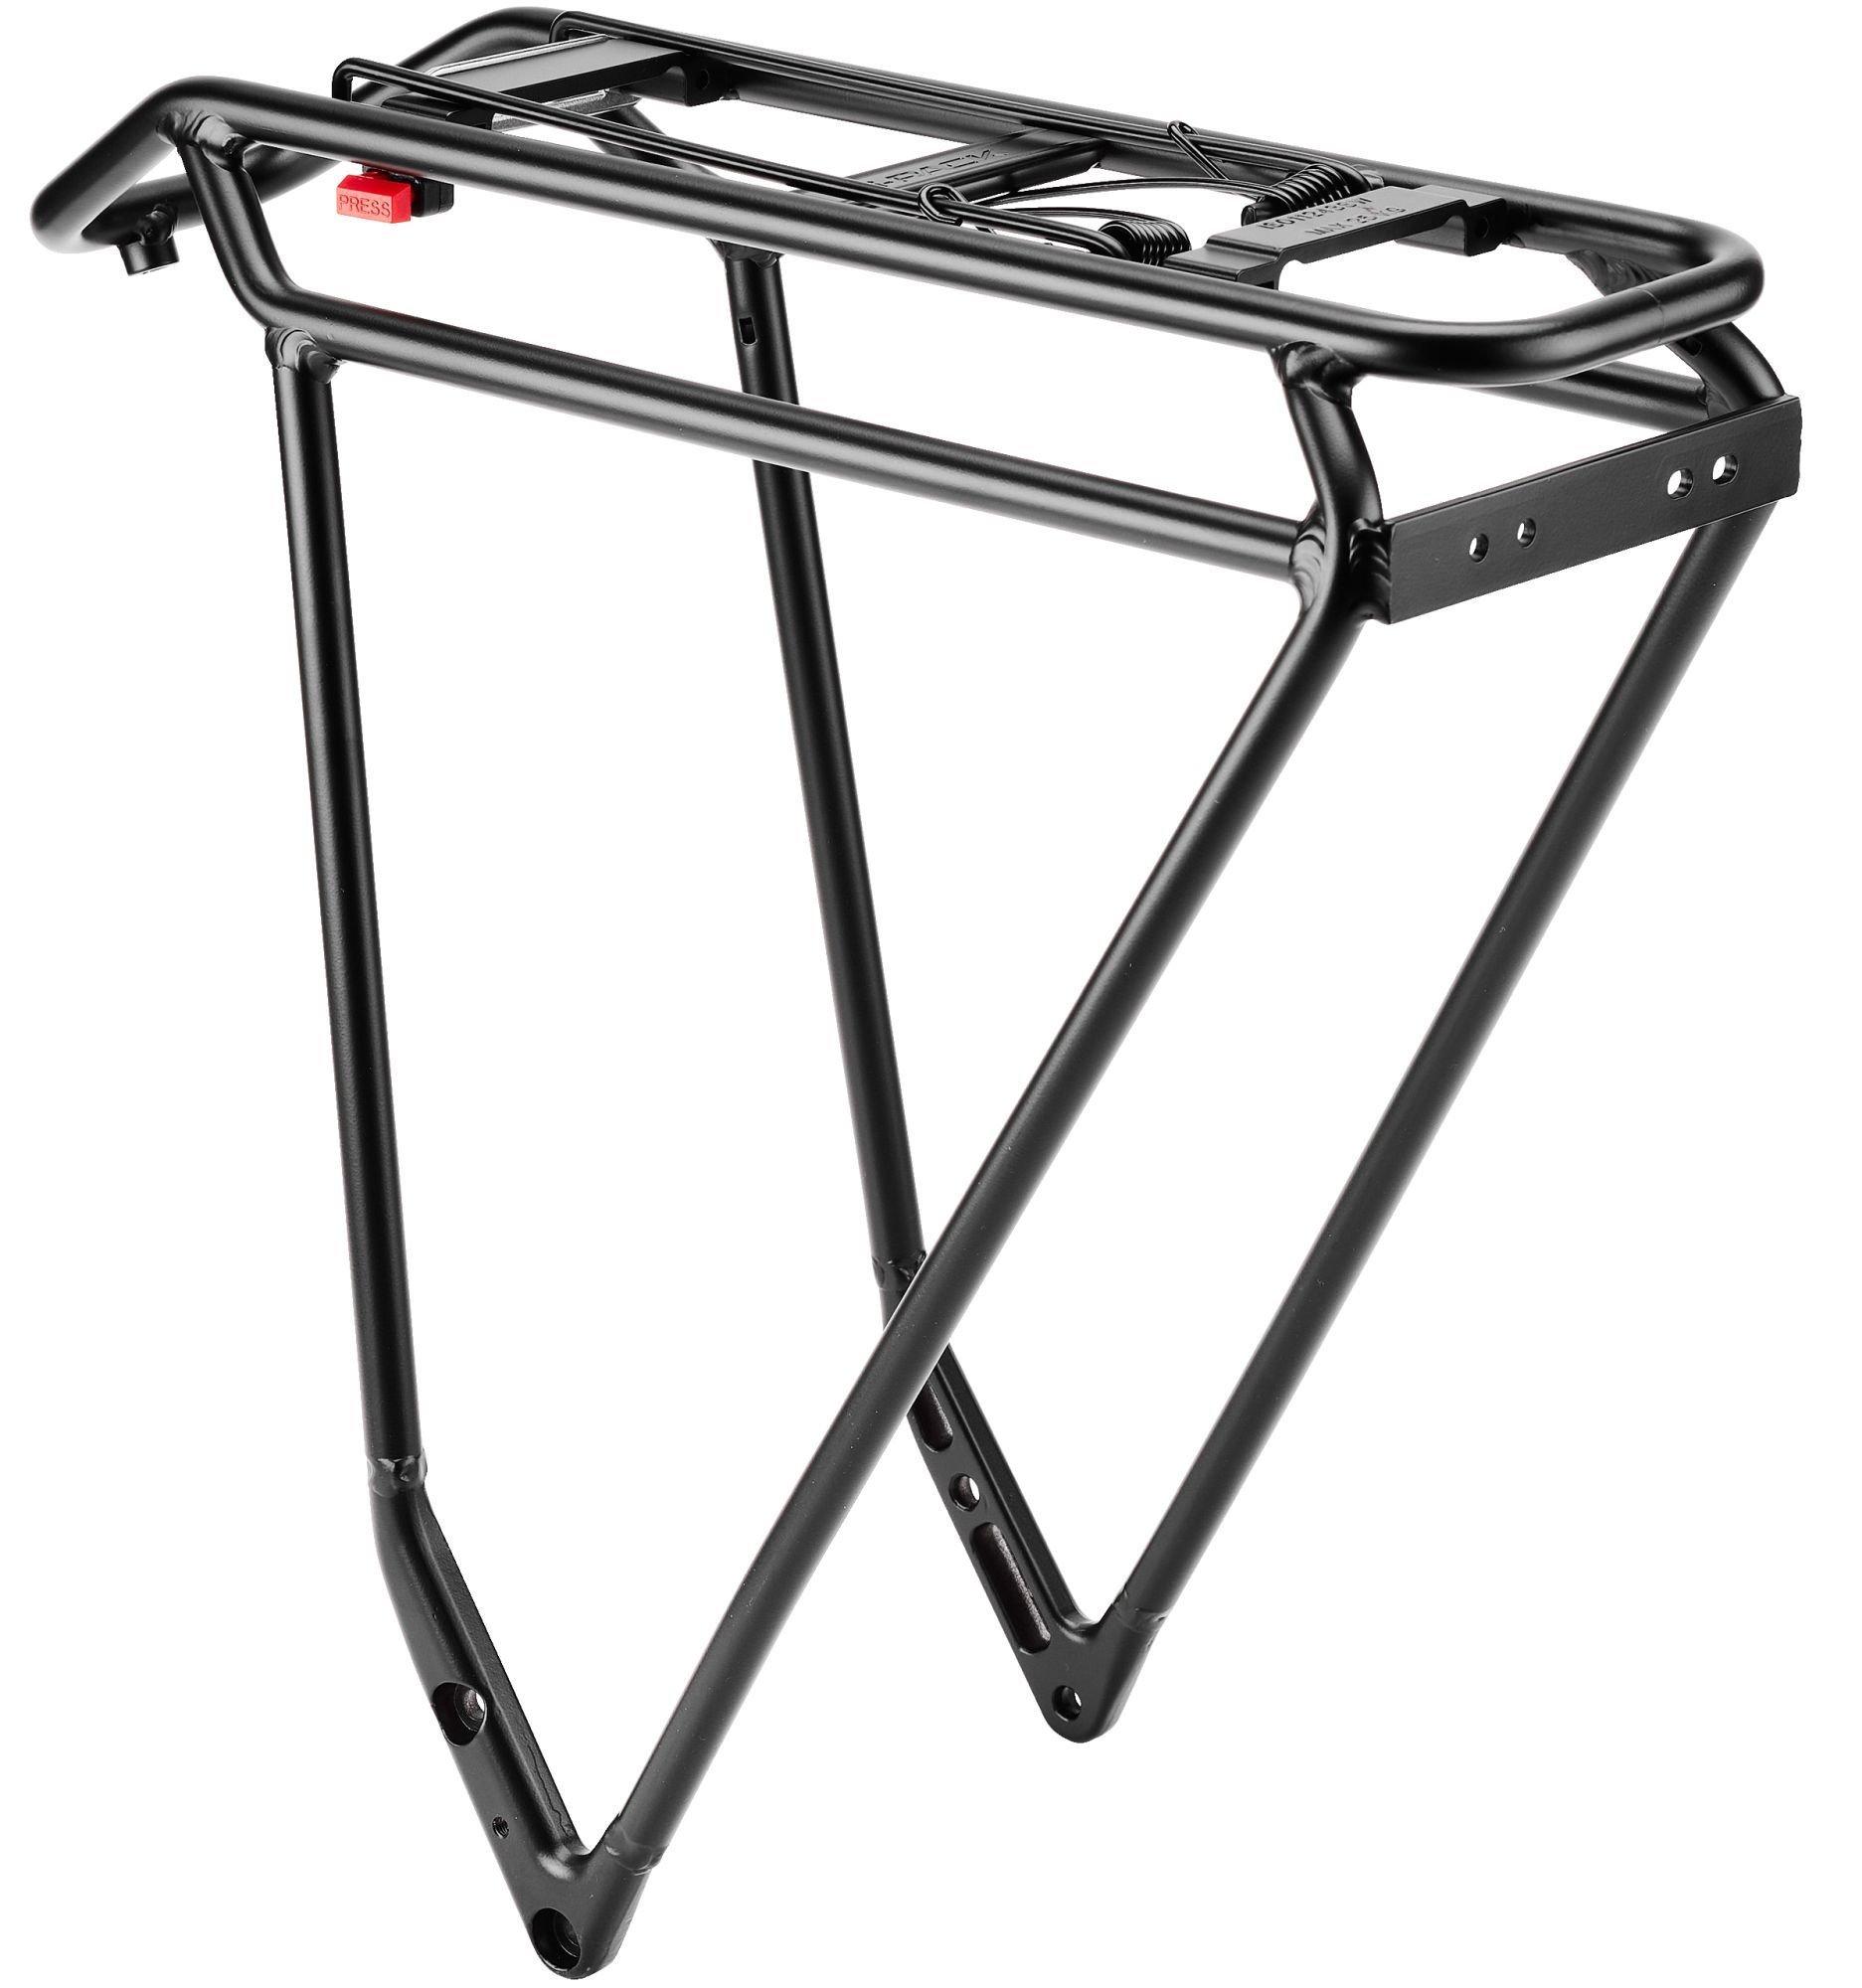 Fahrradteile/Gepäckträger: Standwell  Gepäckträger SW-KM079S 28